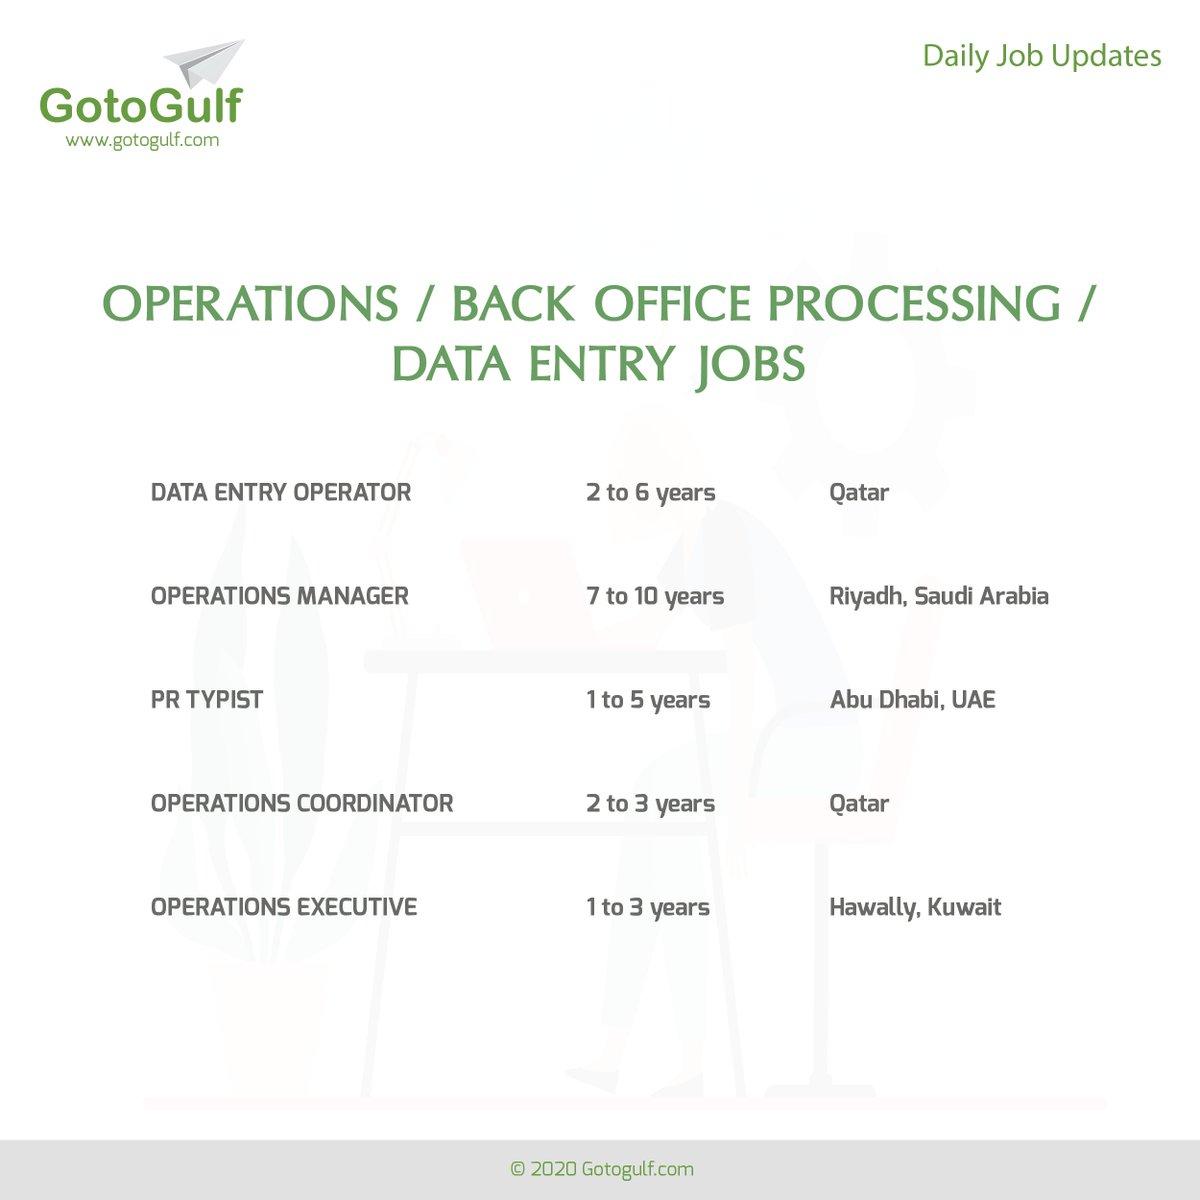 Click on the below link to apply for the job vacancies, https://t.co/YAzvVyfiR6  #gotogulf #jobs #middleeast #jobseeker #recruitment #operation #back #office #process #data #entry #operator #manager #pr #typist #coordinator #executive #qatar #saudiarabia #kuwait #uae https://t.co/QSlhROTENI